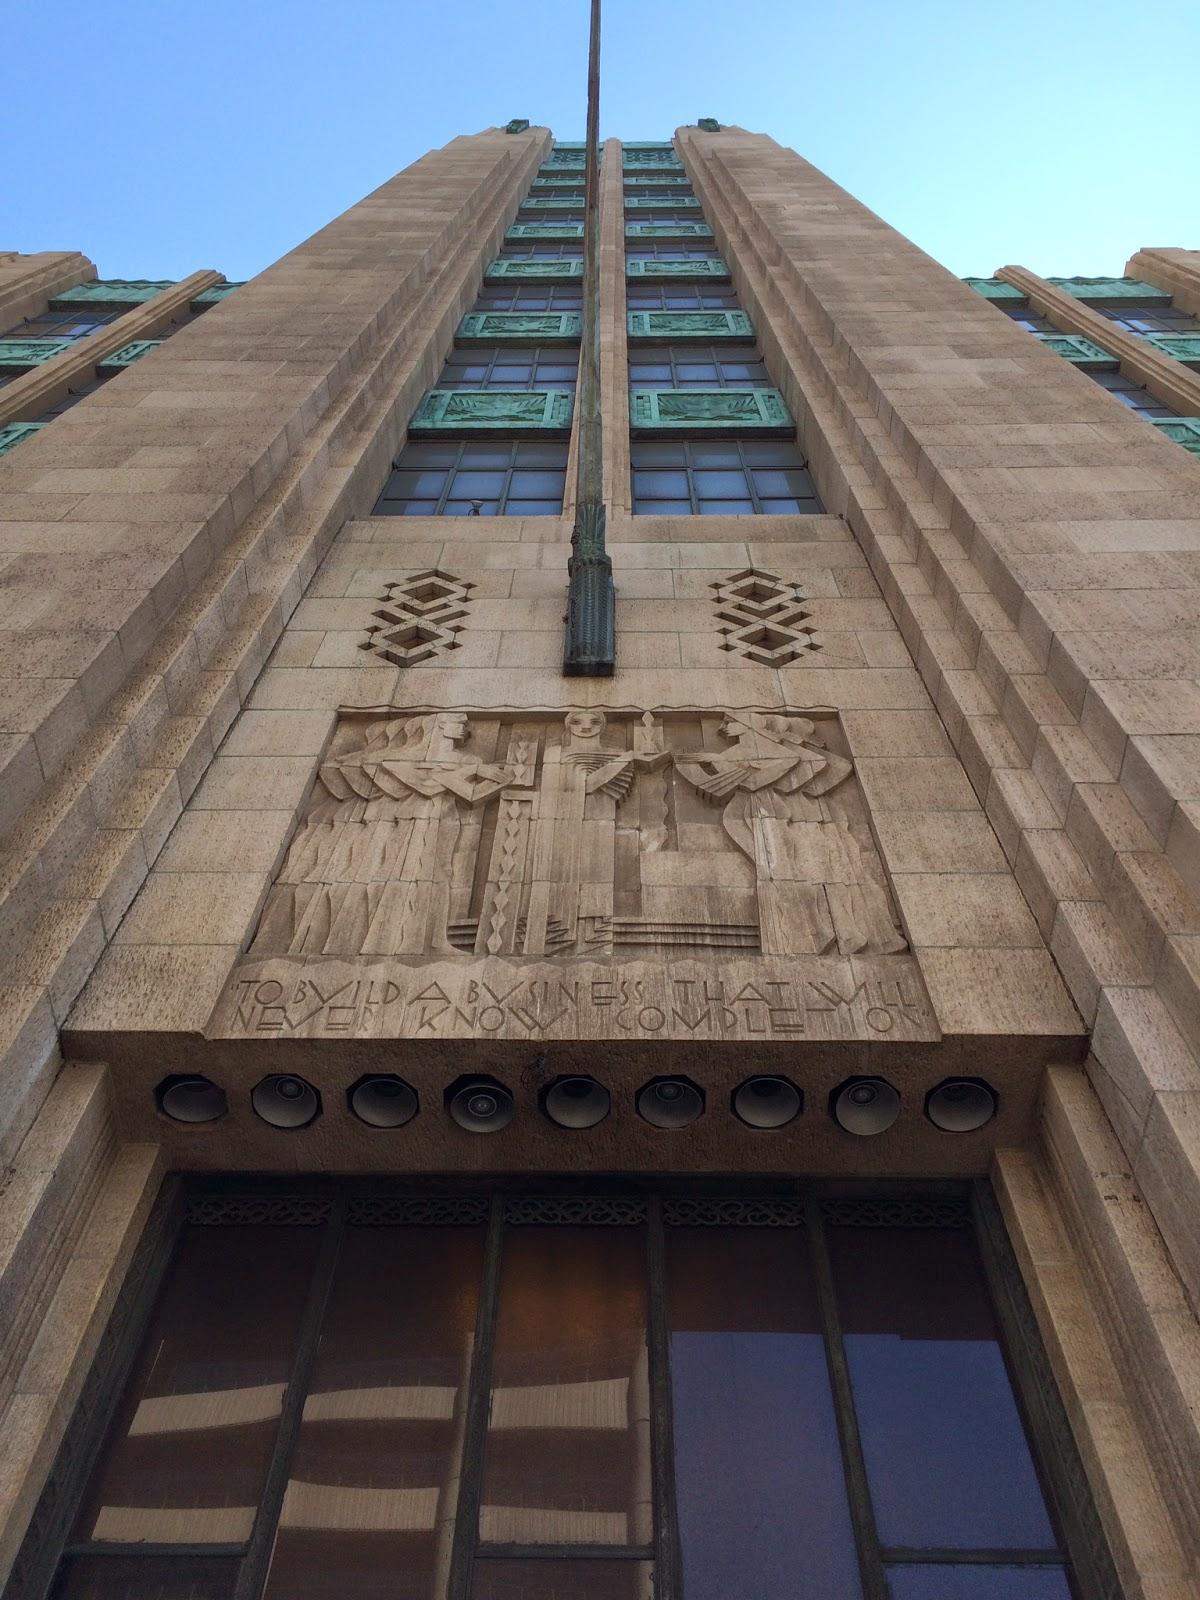 Bullocks Wilshire Building